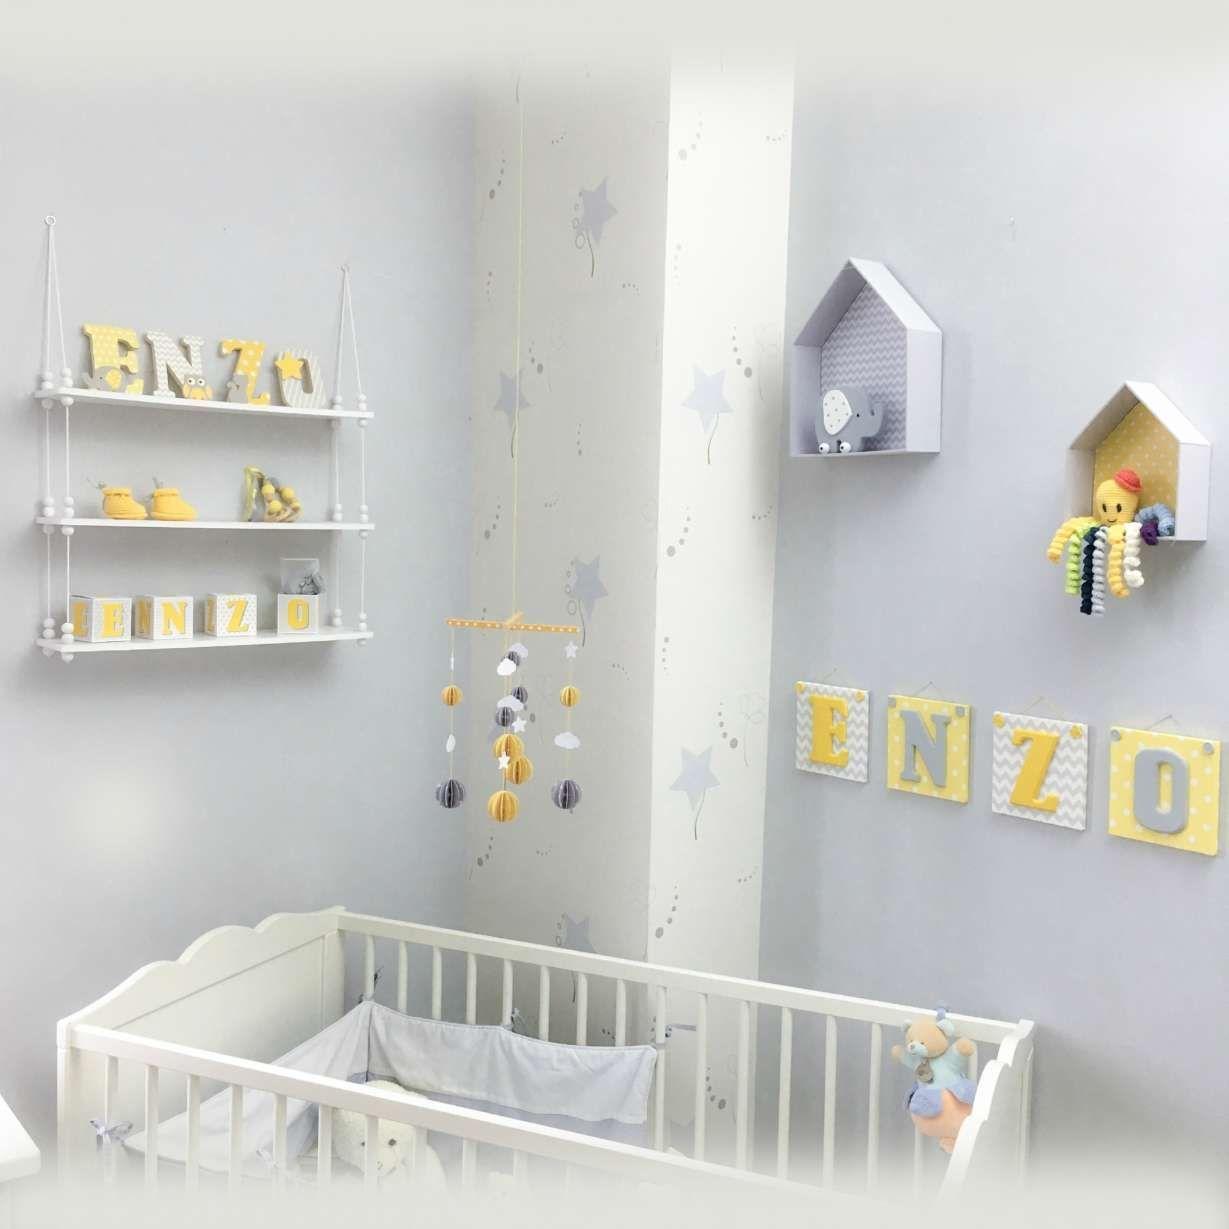 20+ Deco Chambre Bebe Jaune Et Gris  Kids bedroom decor, Room